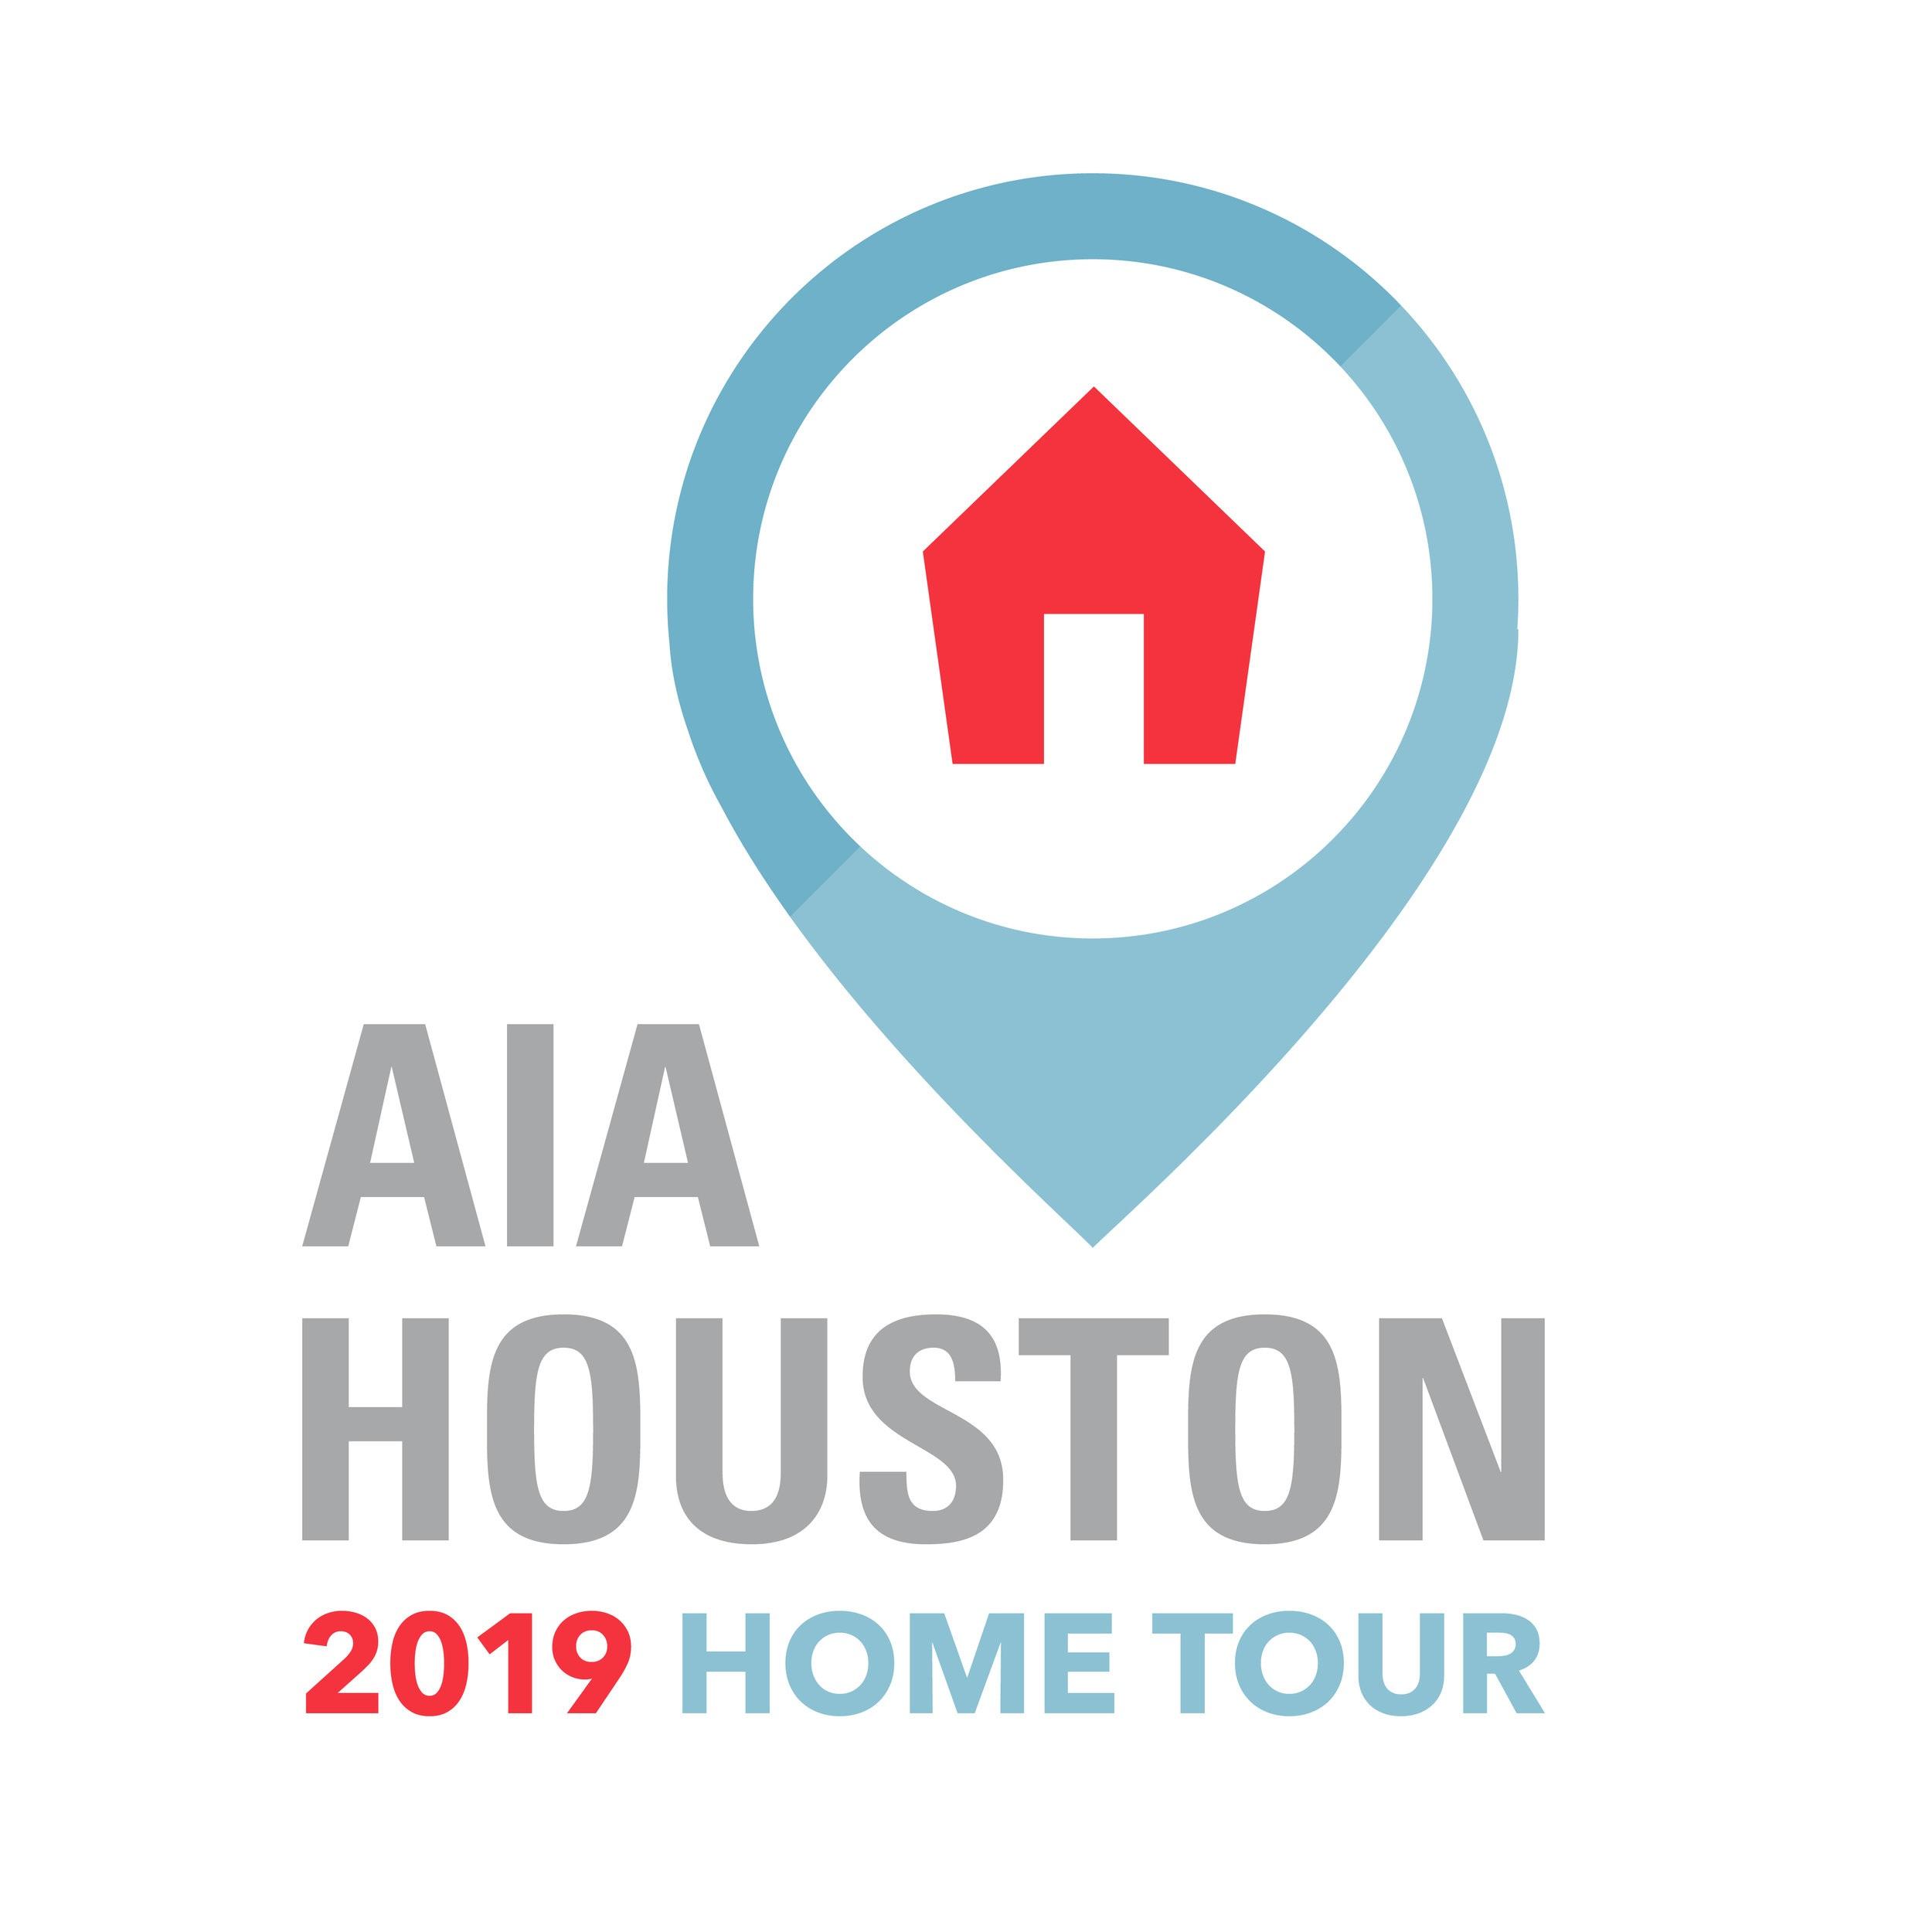 AIA Houston Home Tour - Oct. 19-20, Noon-6pm$25.